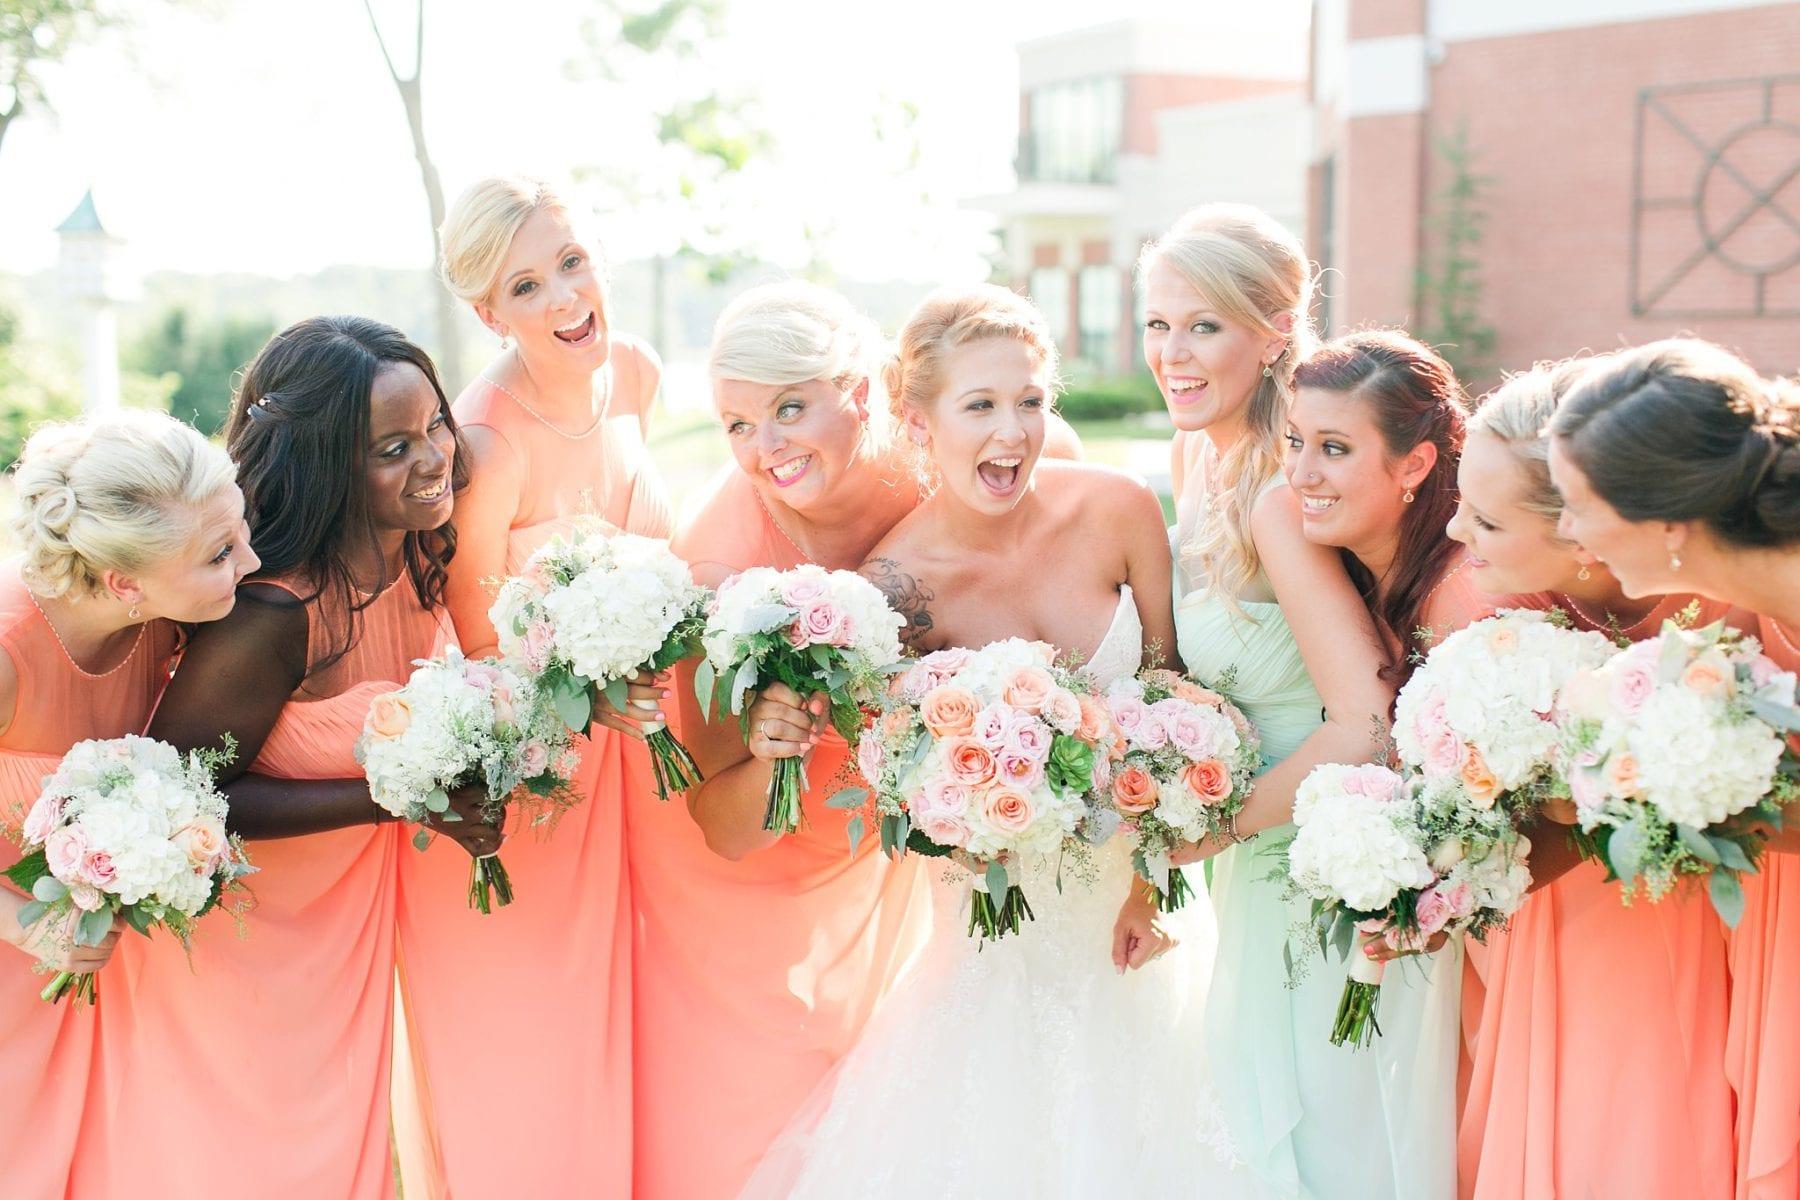 Waters Edge Wedding Photos Maryland Wedding Photographer Megan Kelsey Photography Katie & Conor-388.JPG